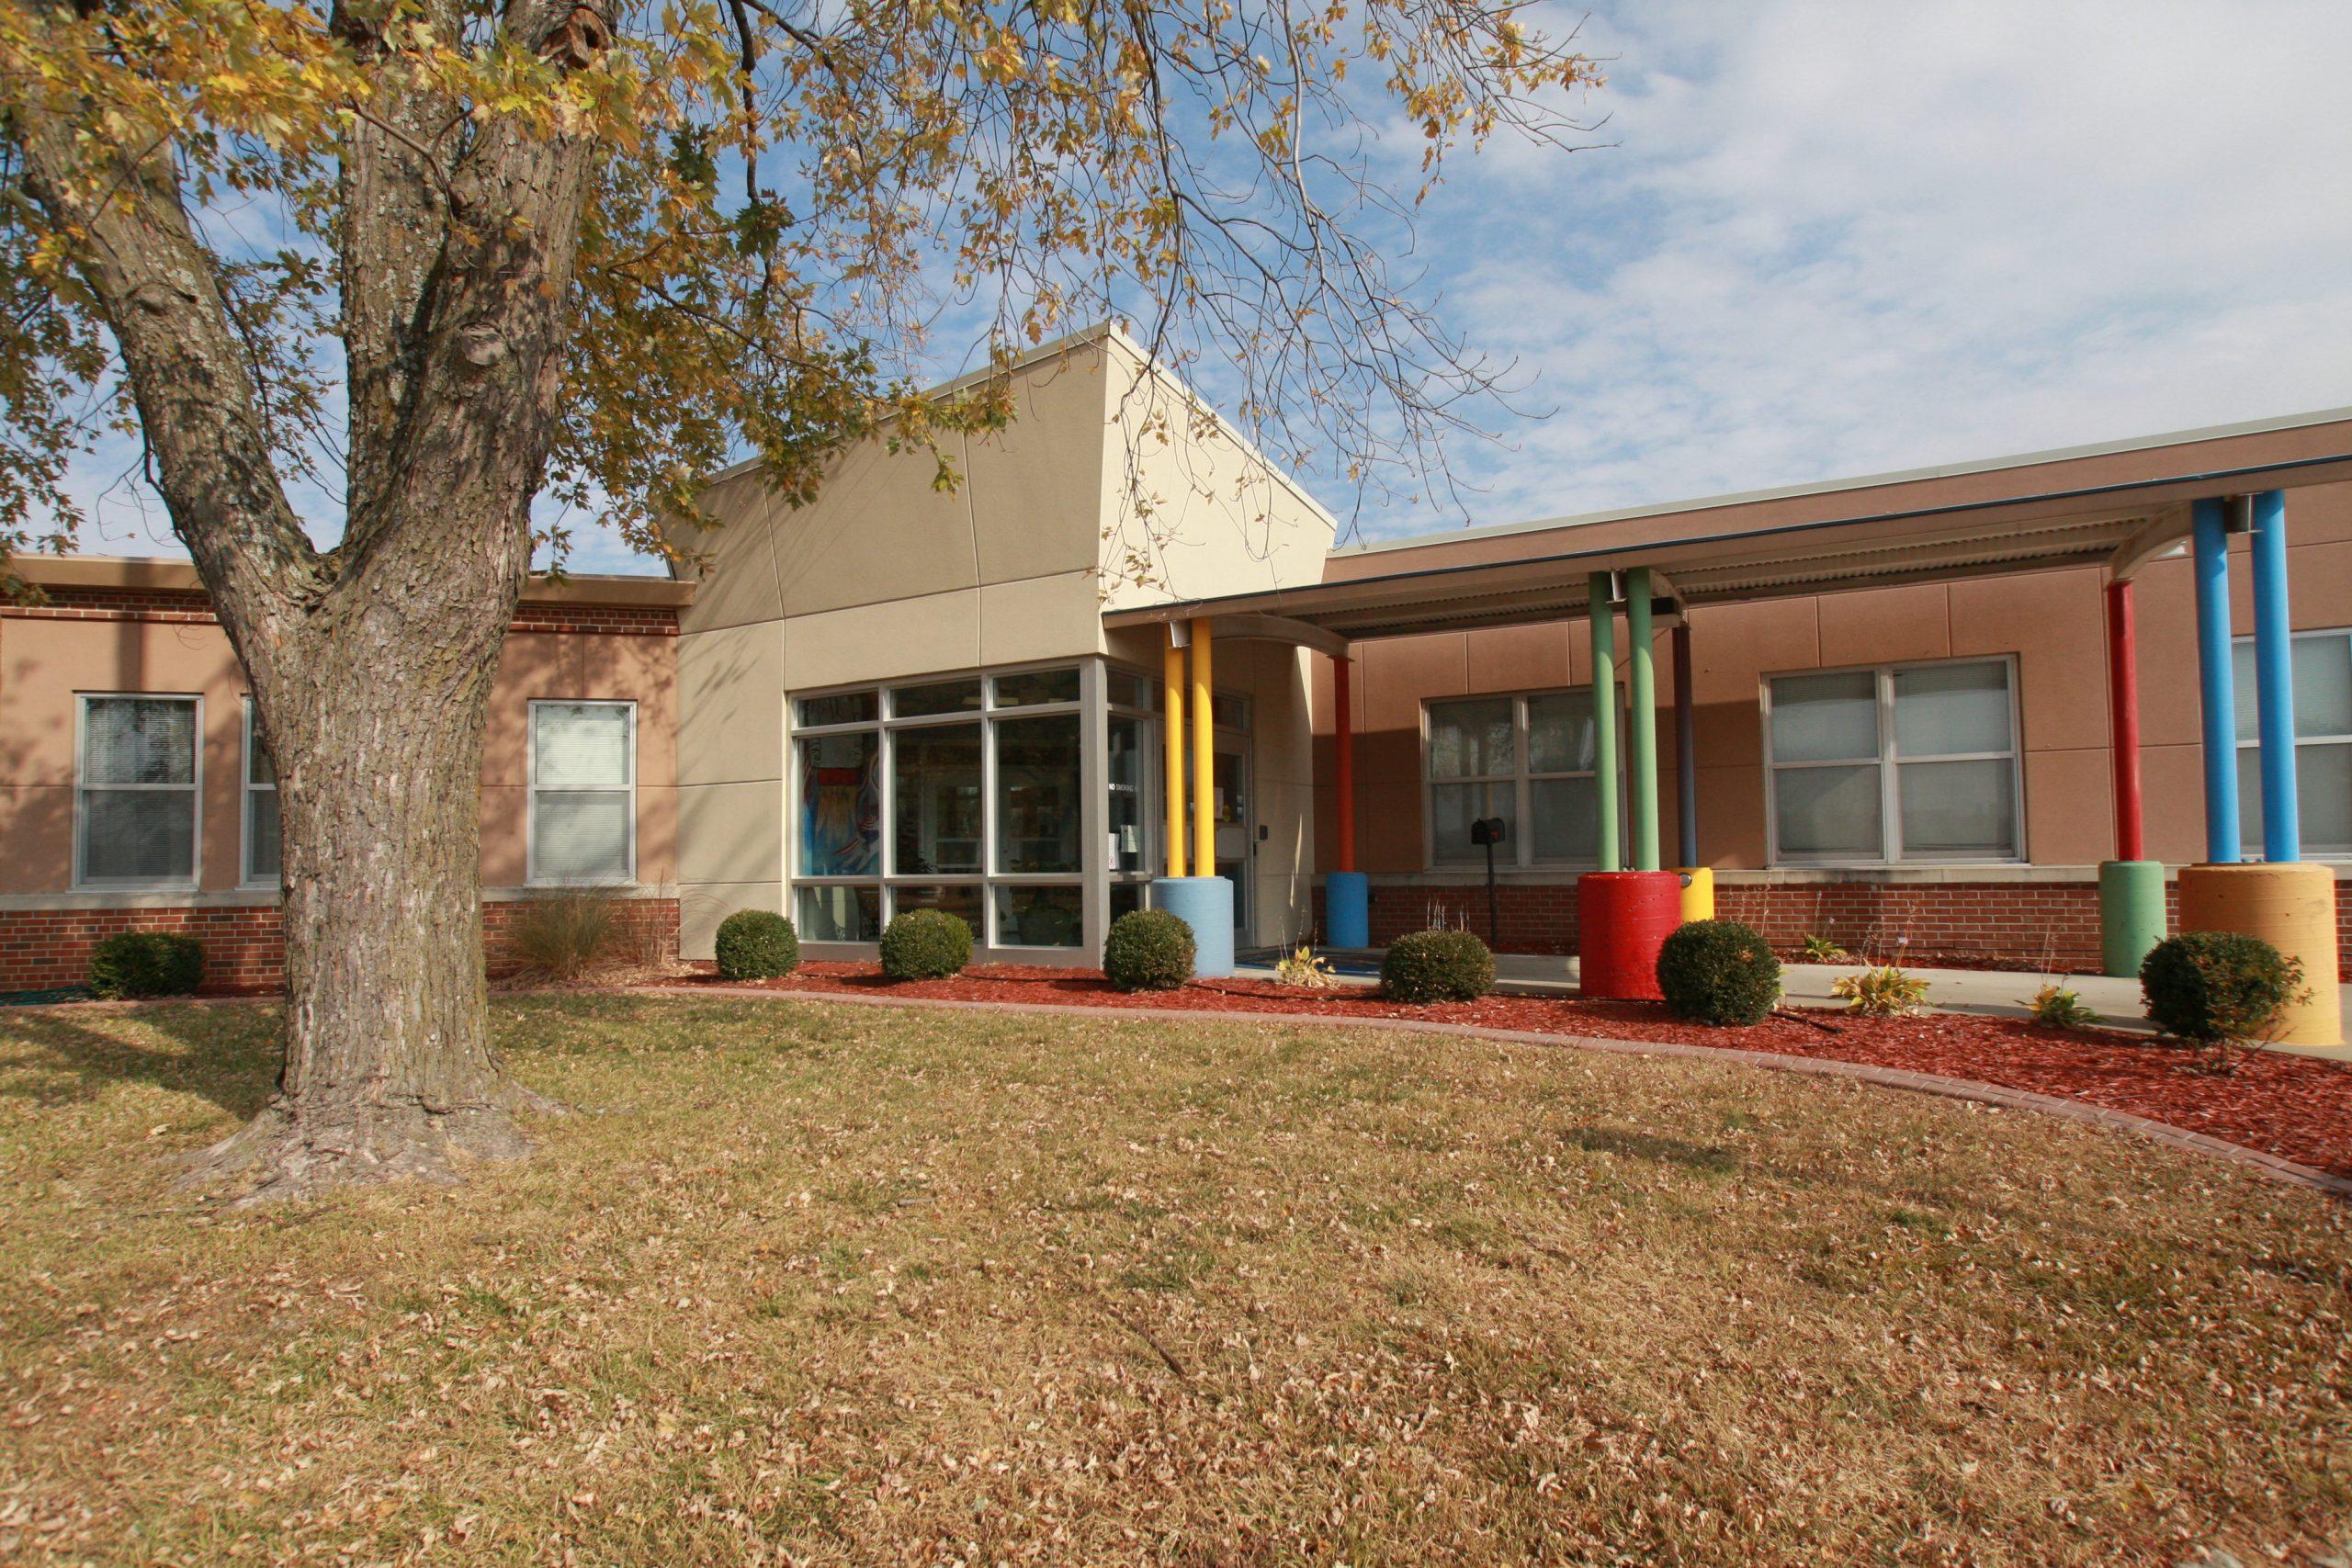 Randall Elementary School Intended For School Break For Independence. Missouri Schools